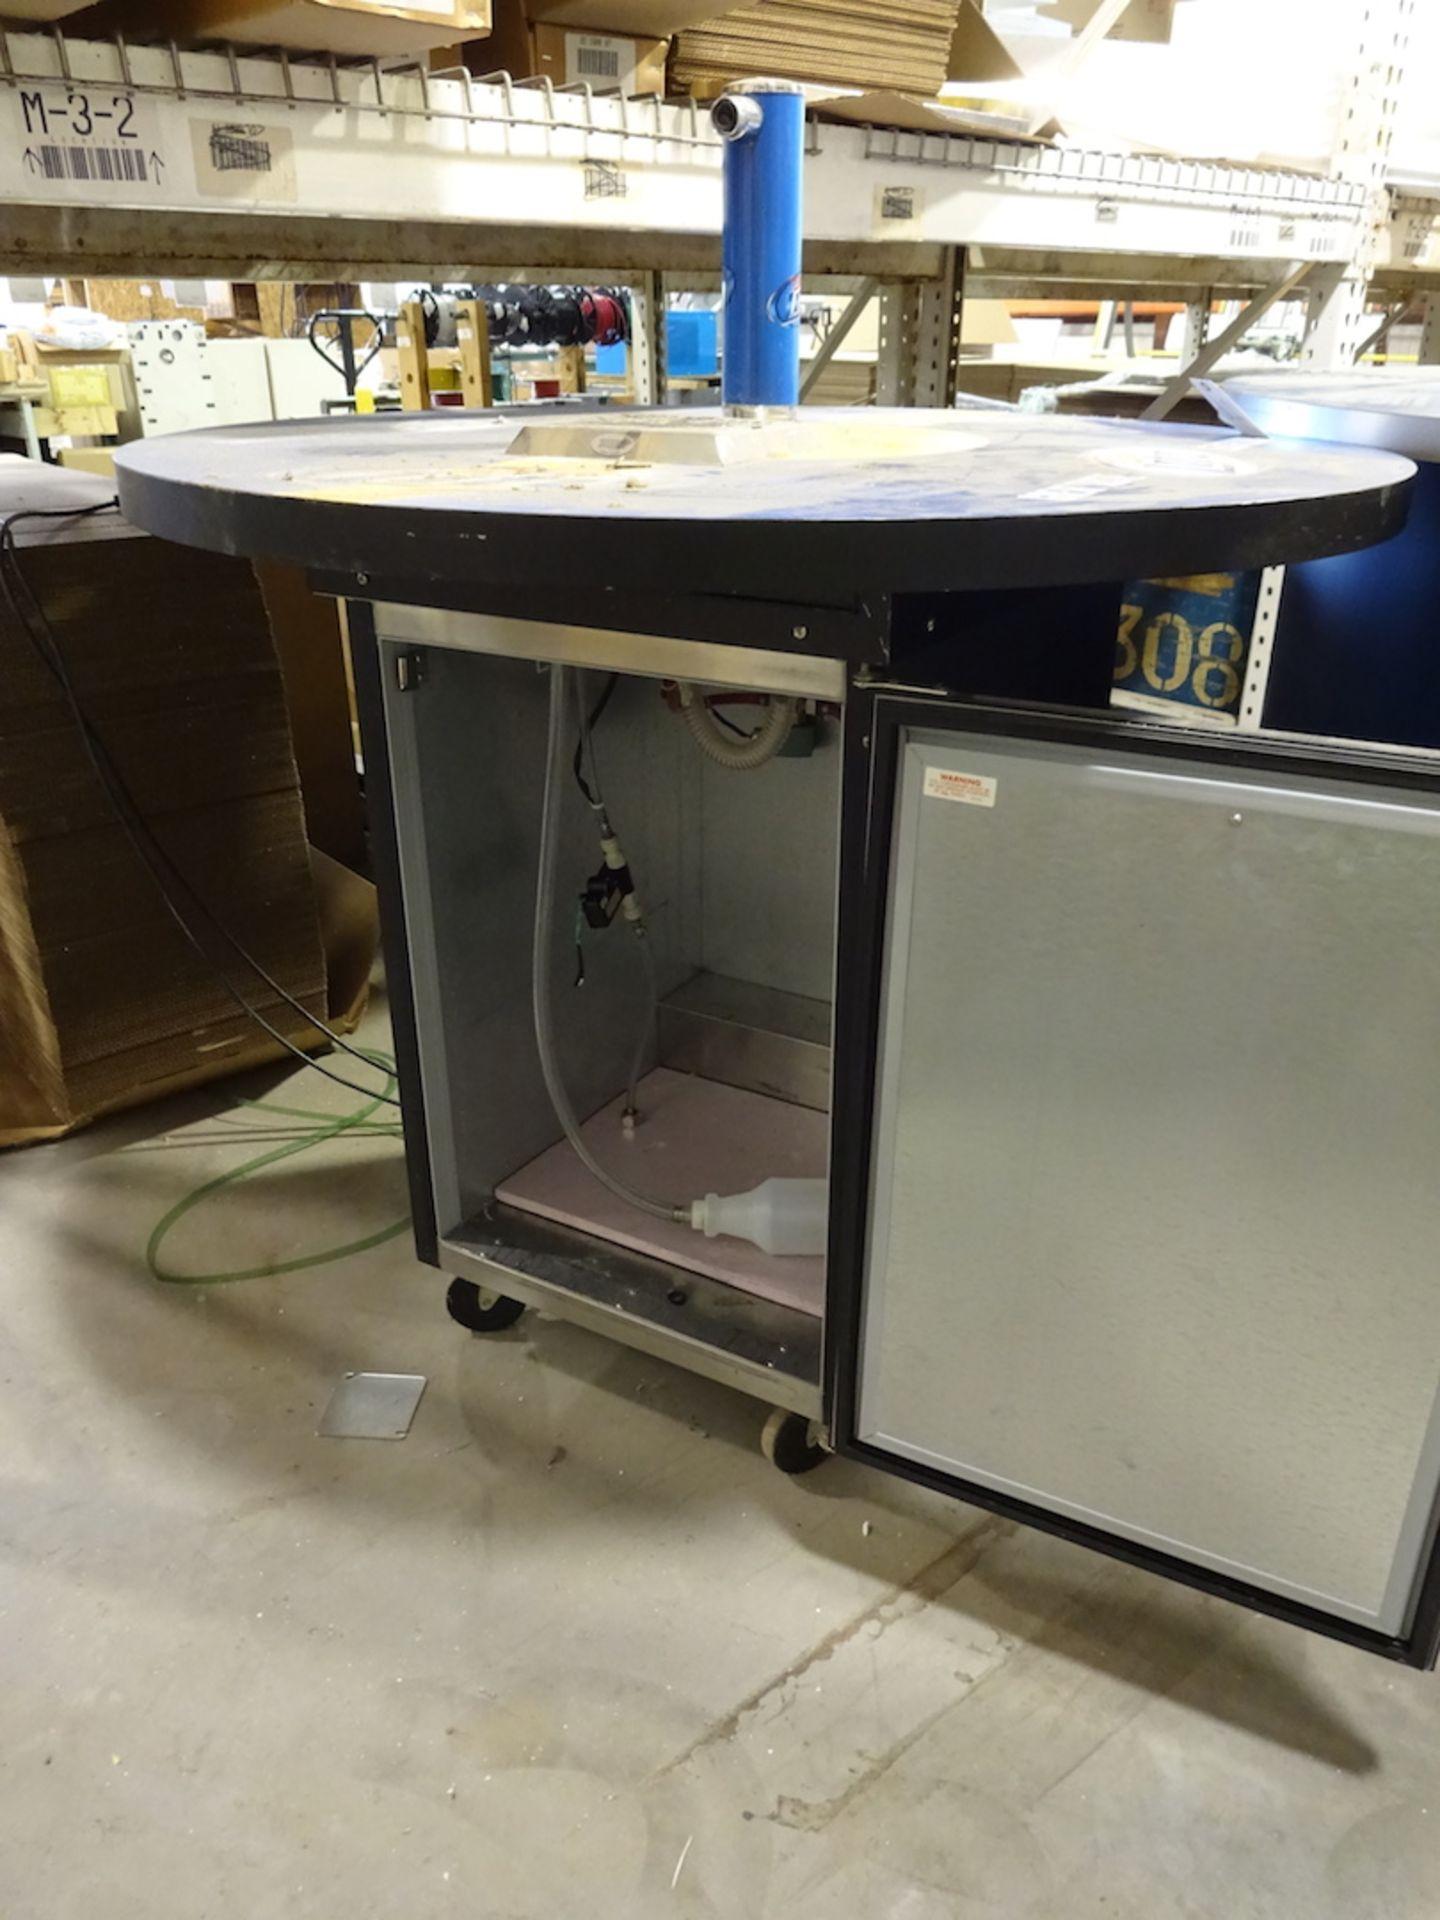 Lot 126 - Beverage Air 1/2 Barrel Beer Cooler, with Top (Kegerator)